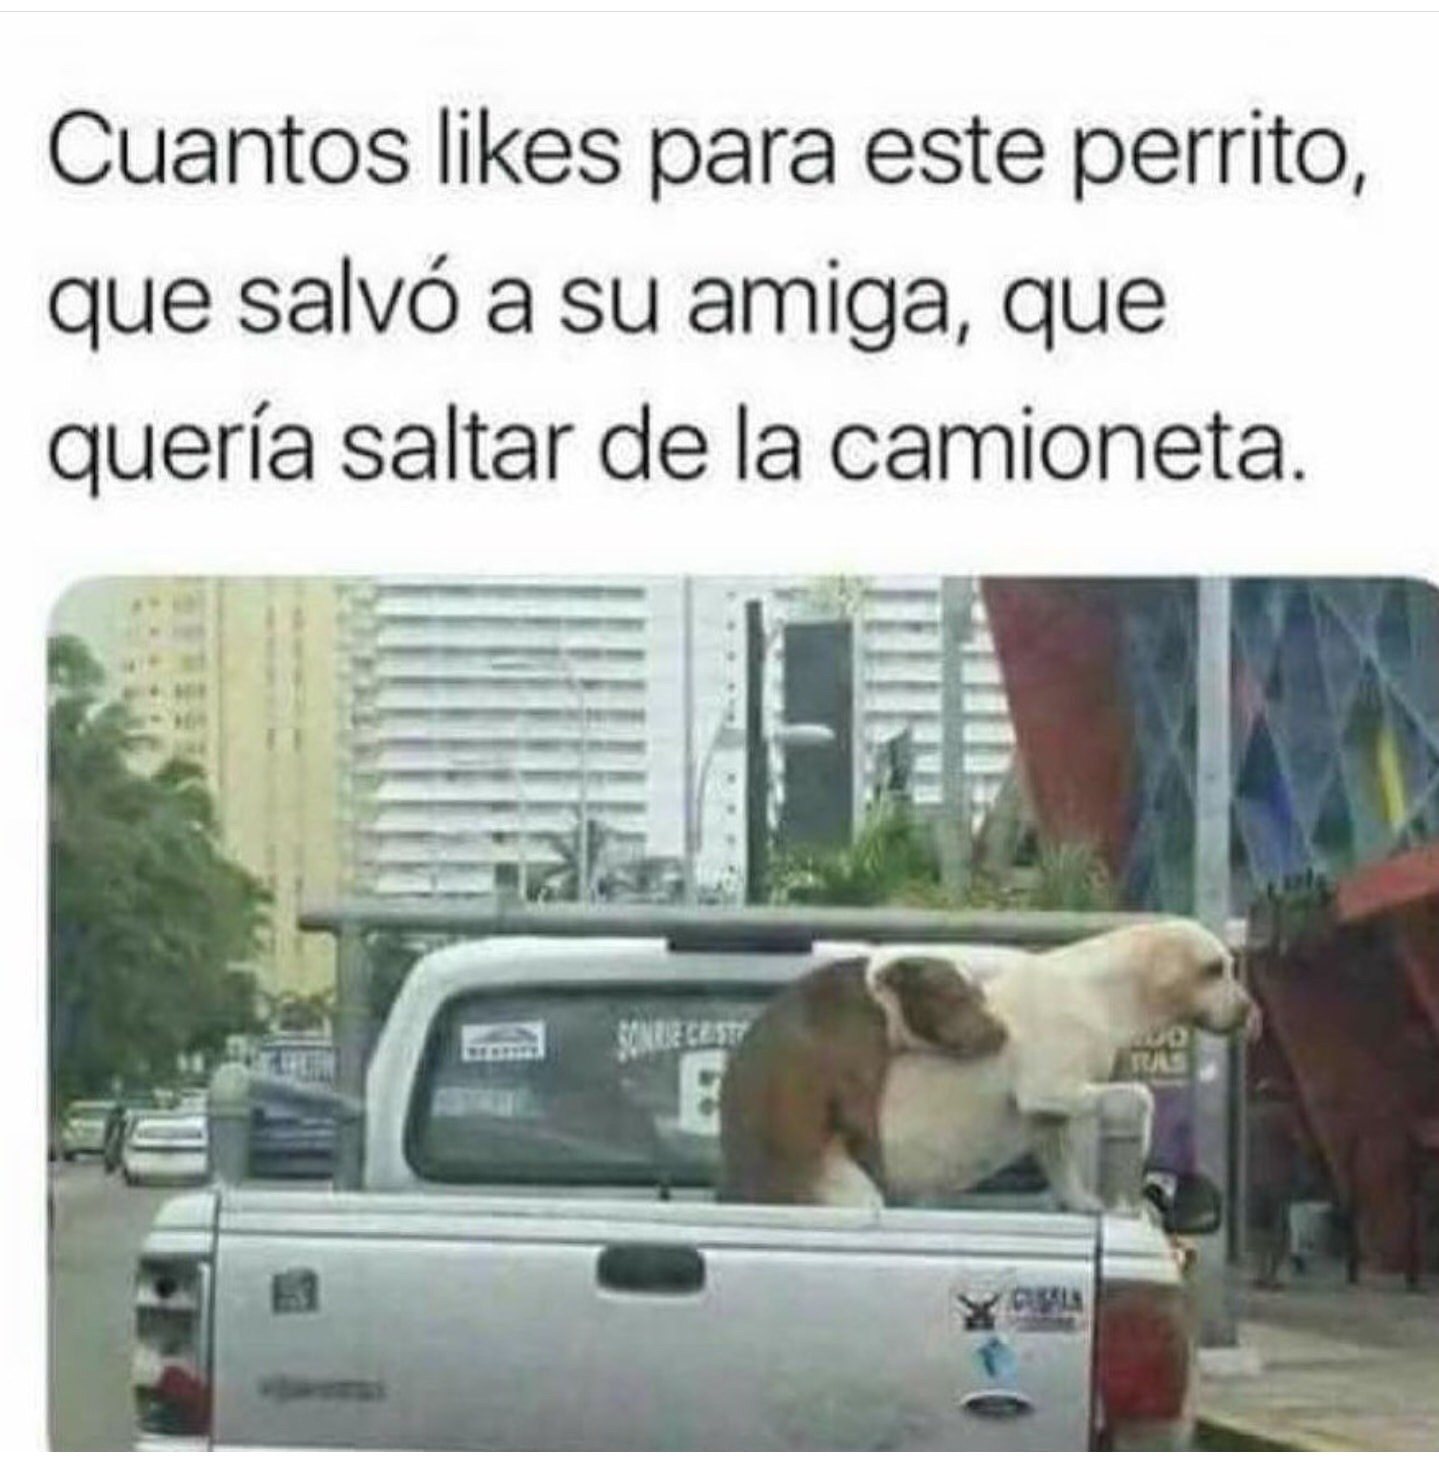 Ultimos memes 2019 en español @ memesnuevos.top